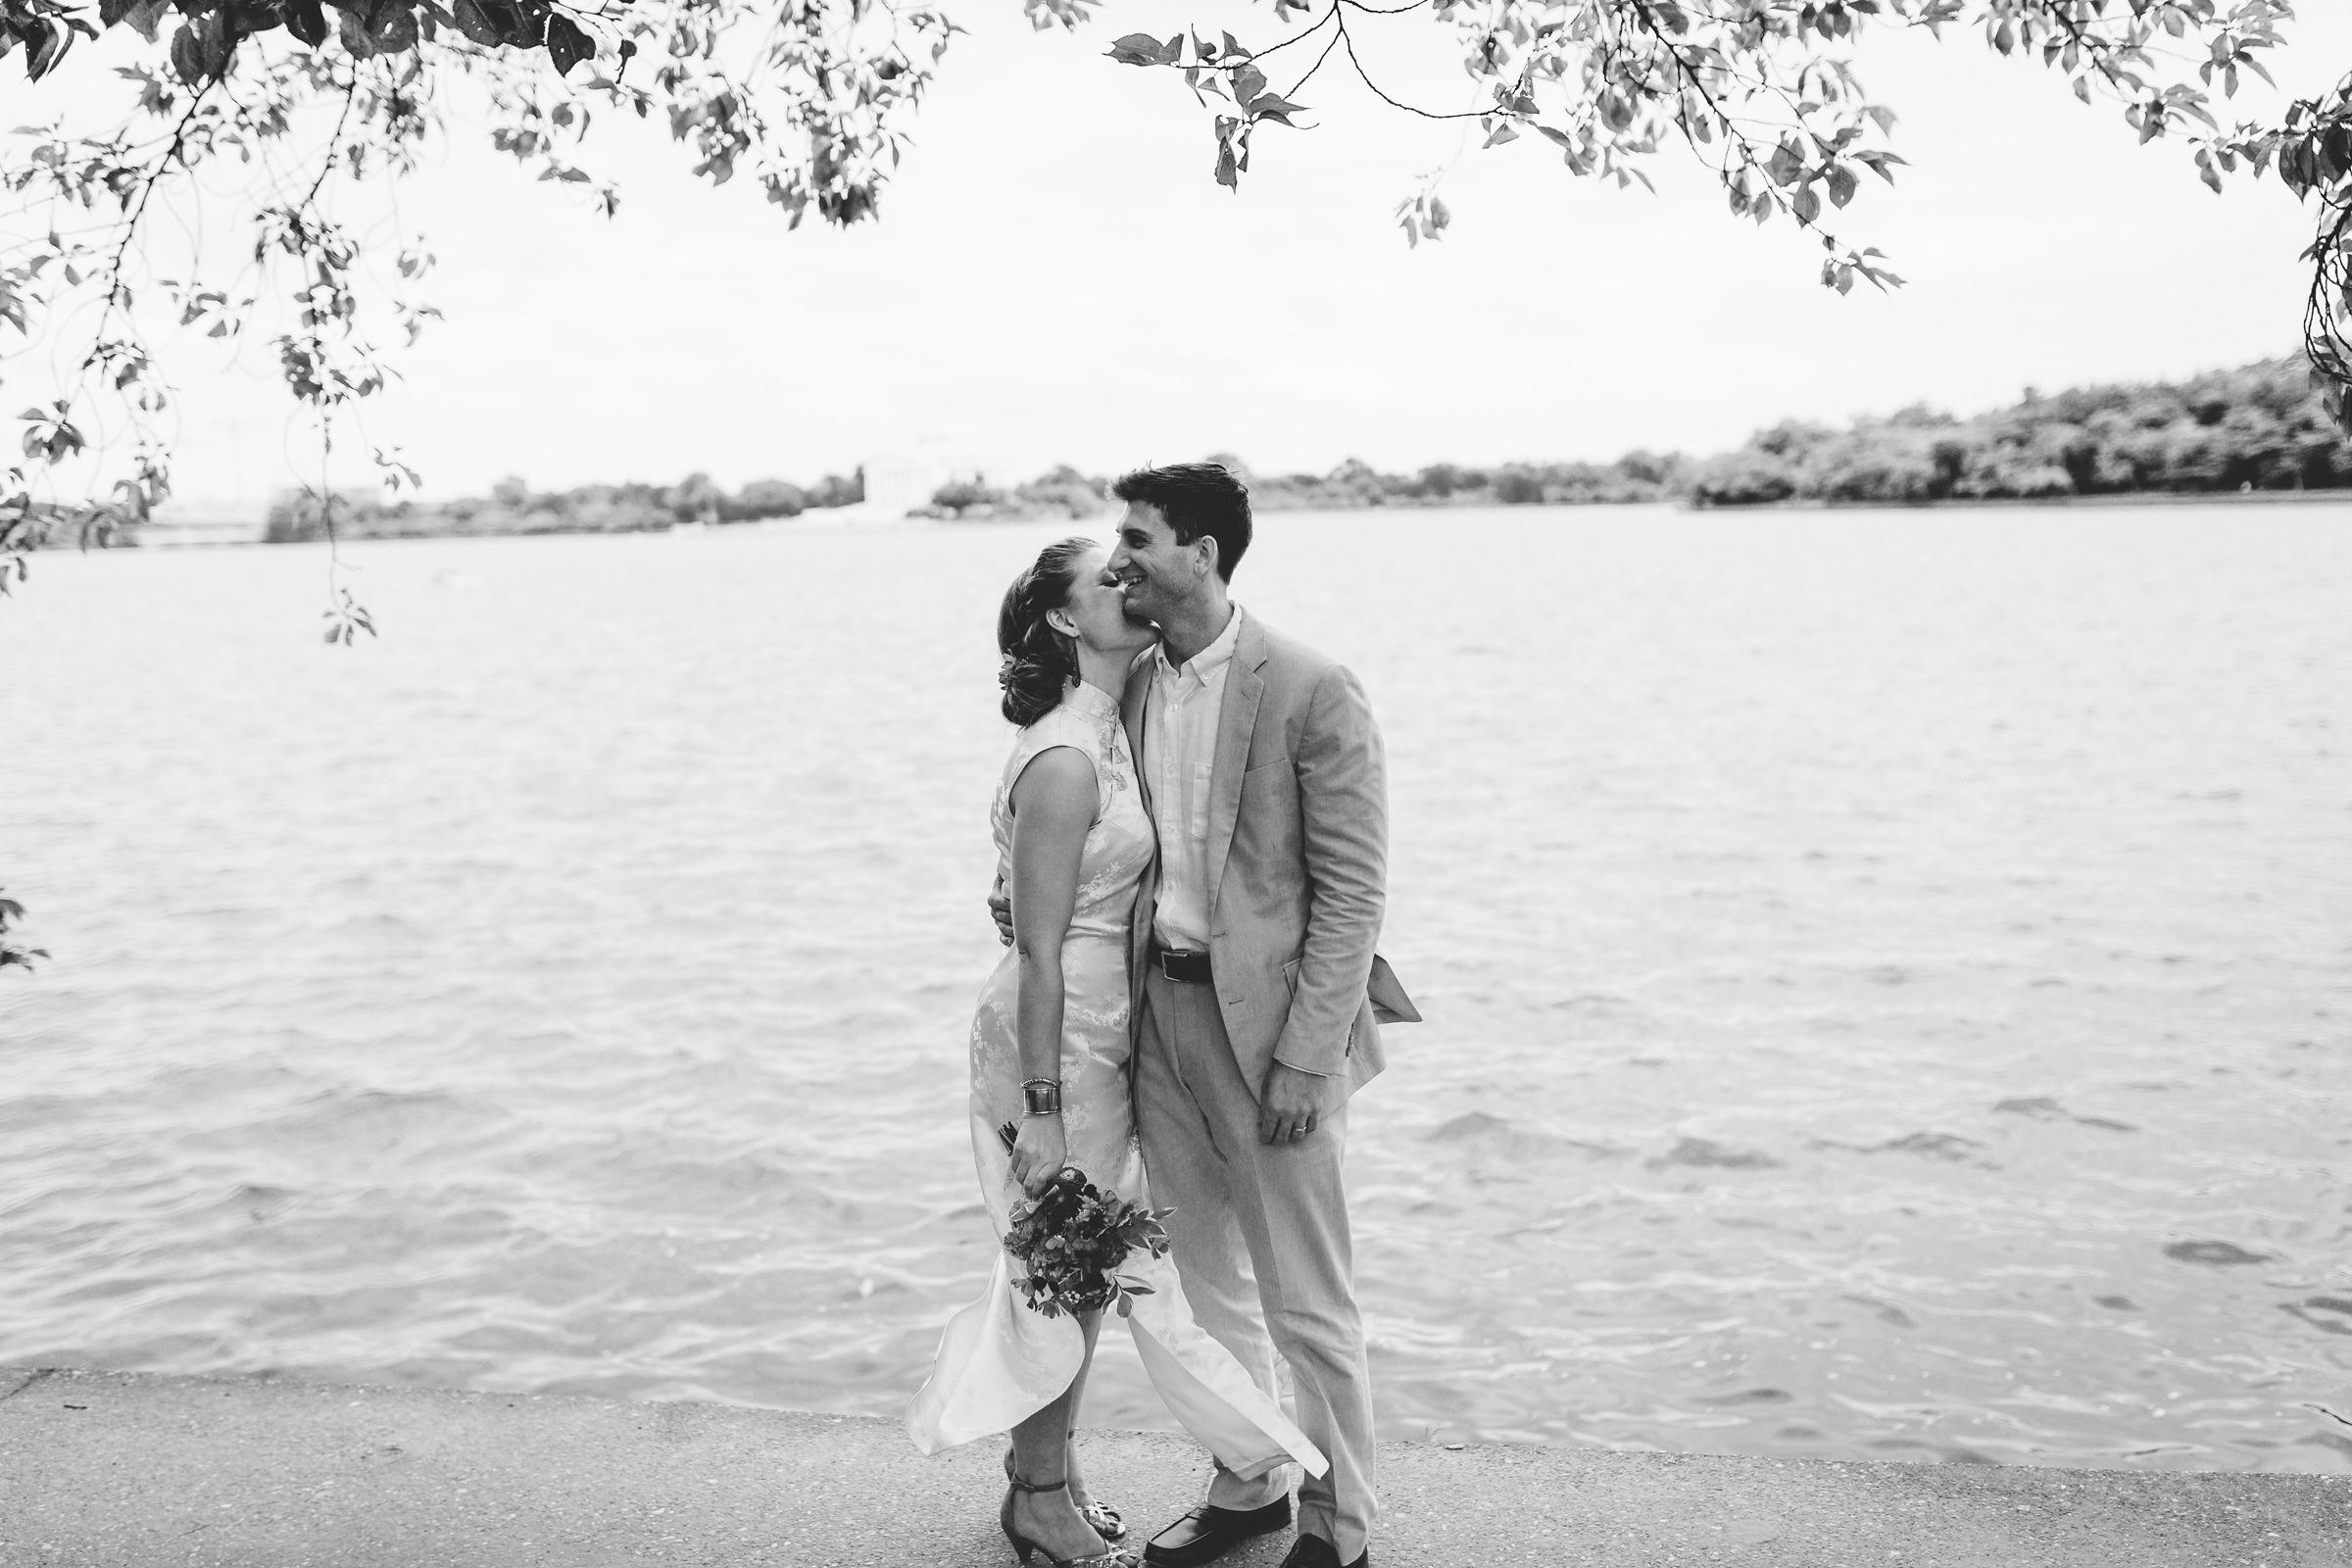 Kentucky_Candid_Wedding_Photographer_172.jpg